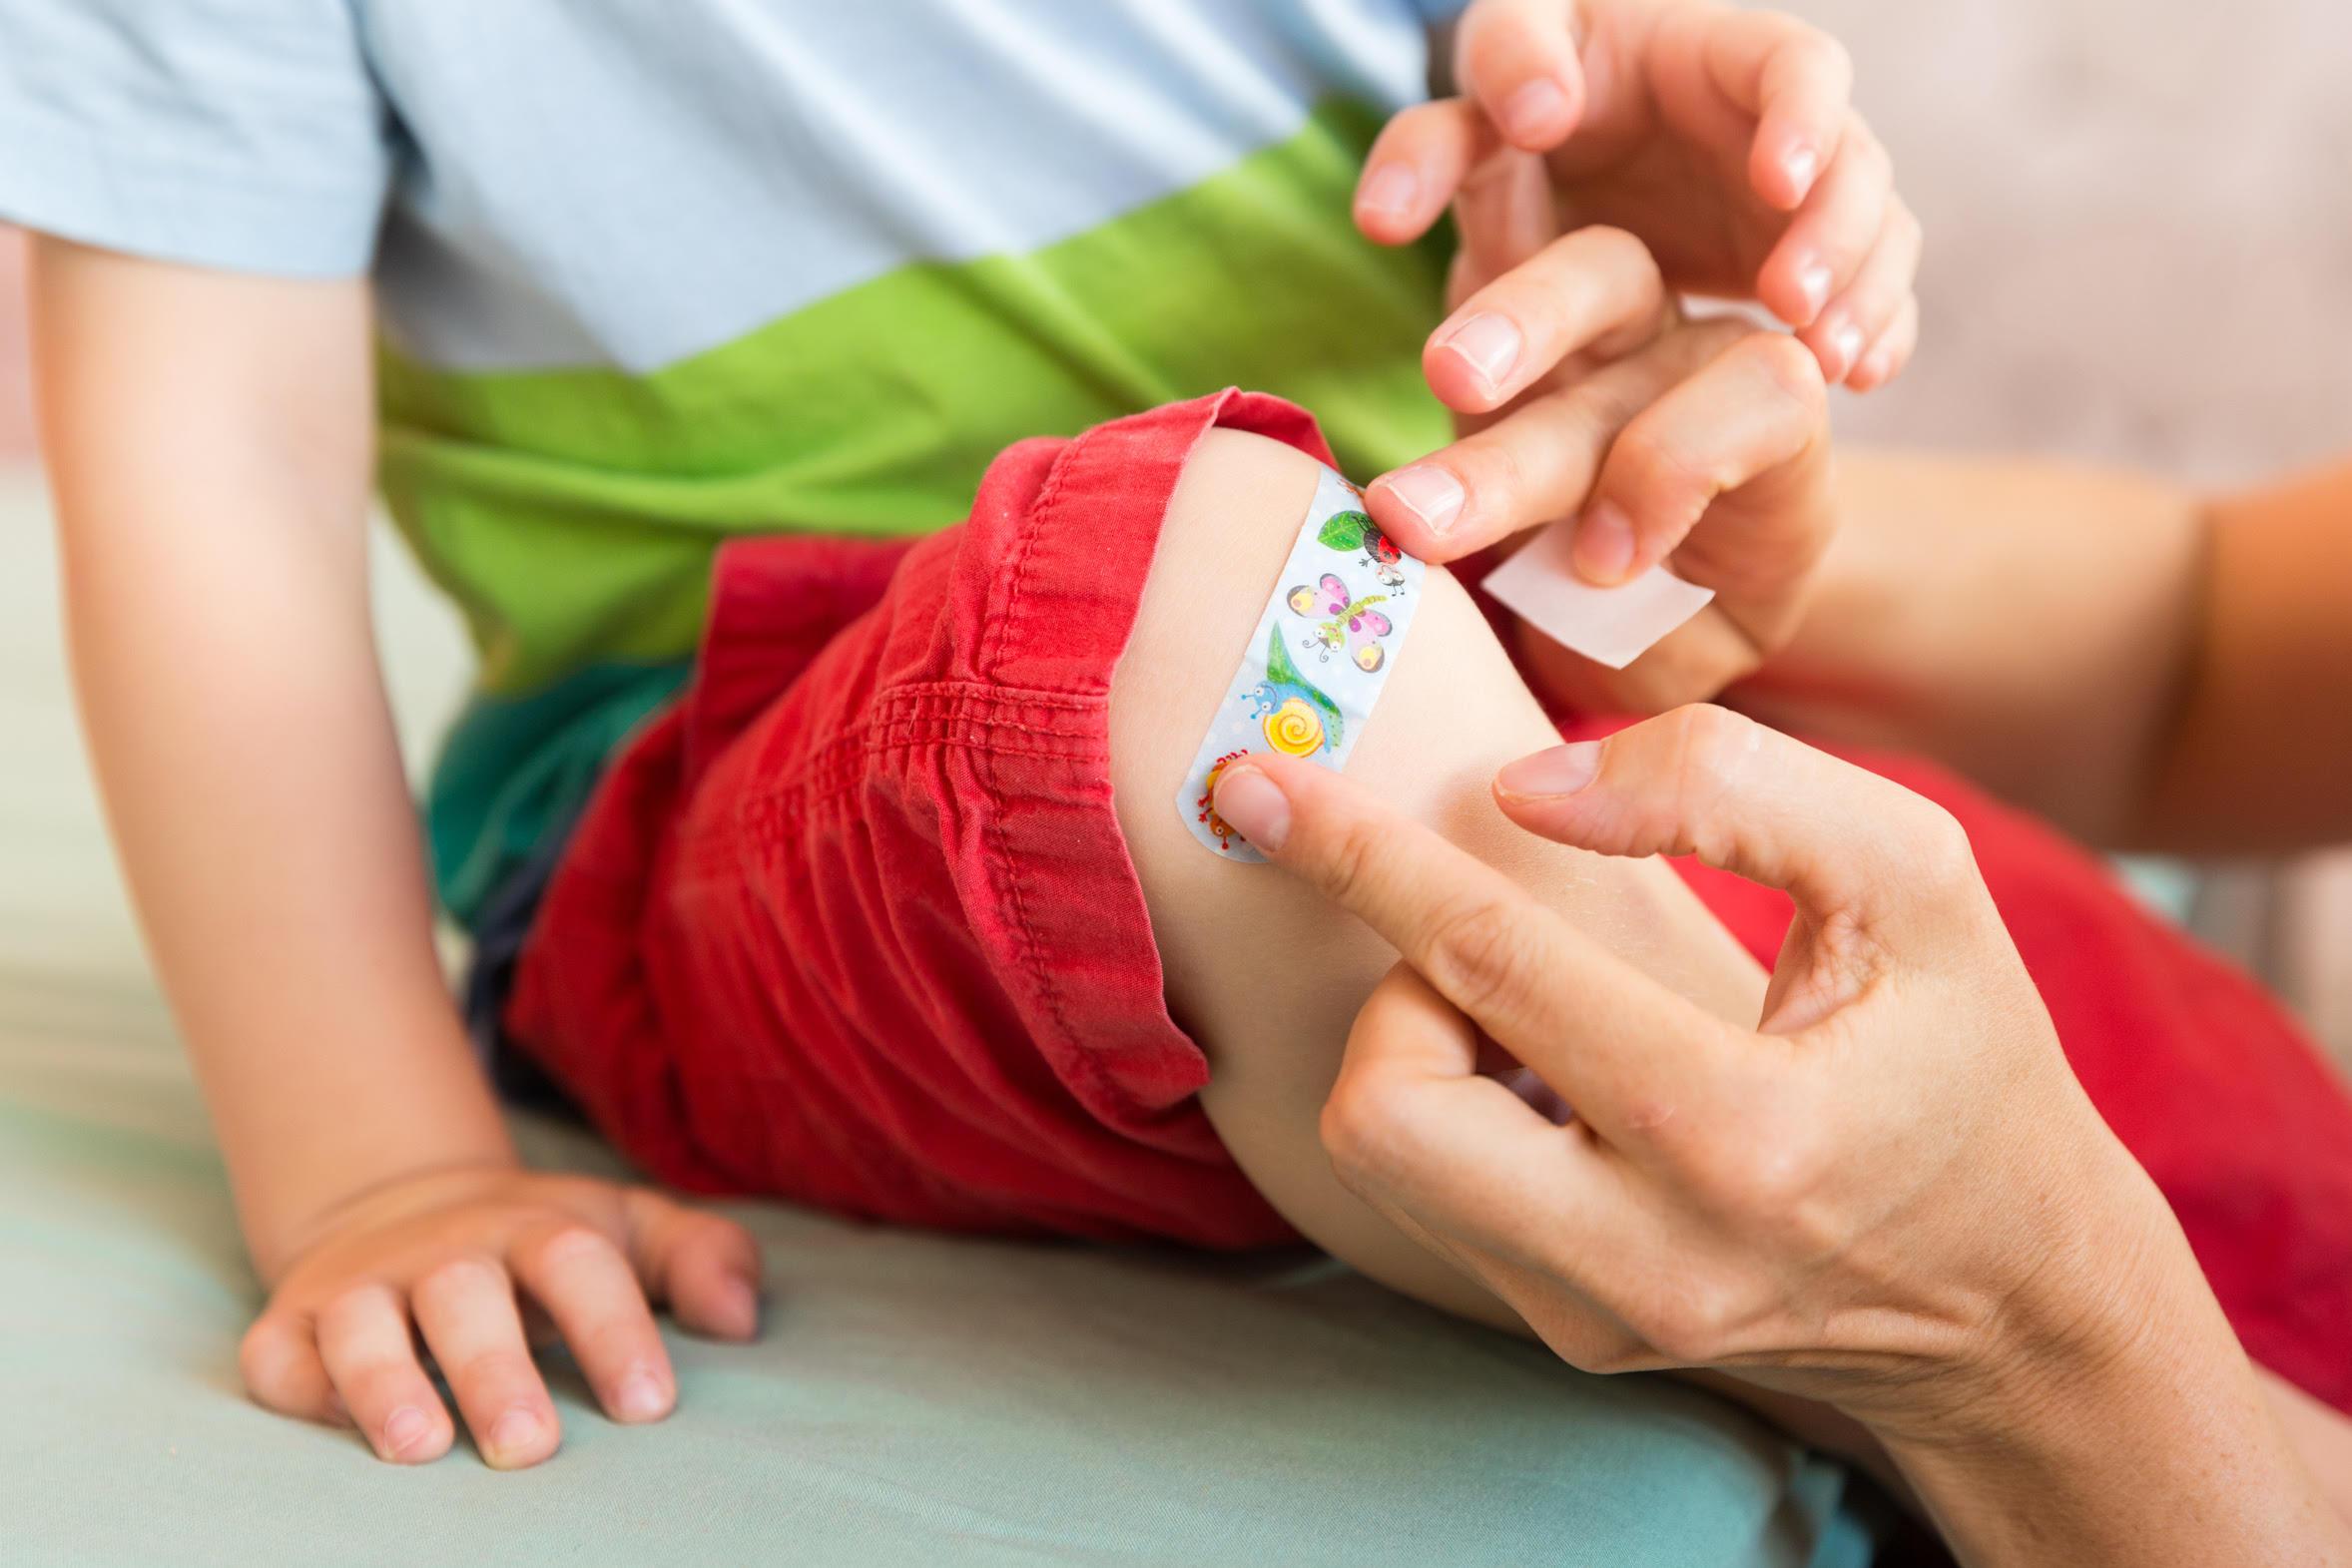 Desinfectar una herida